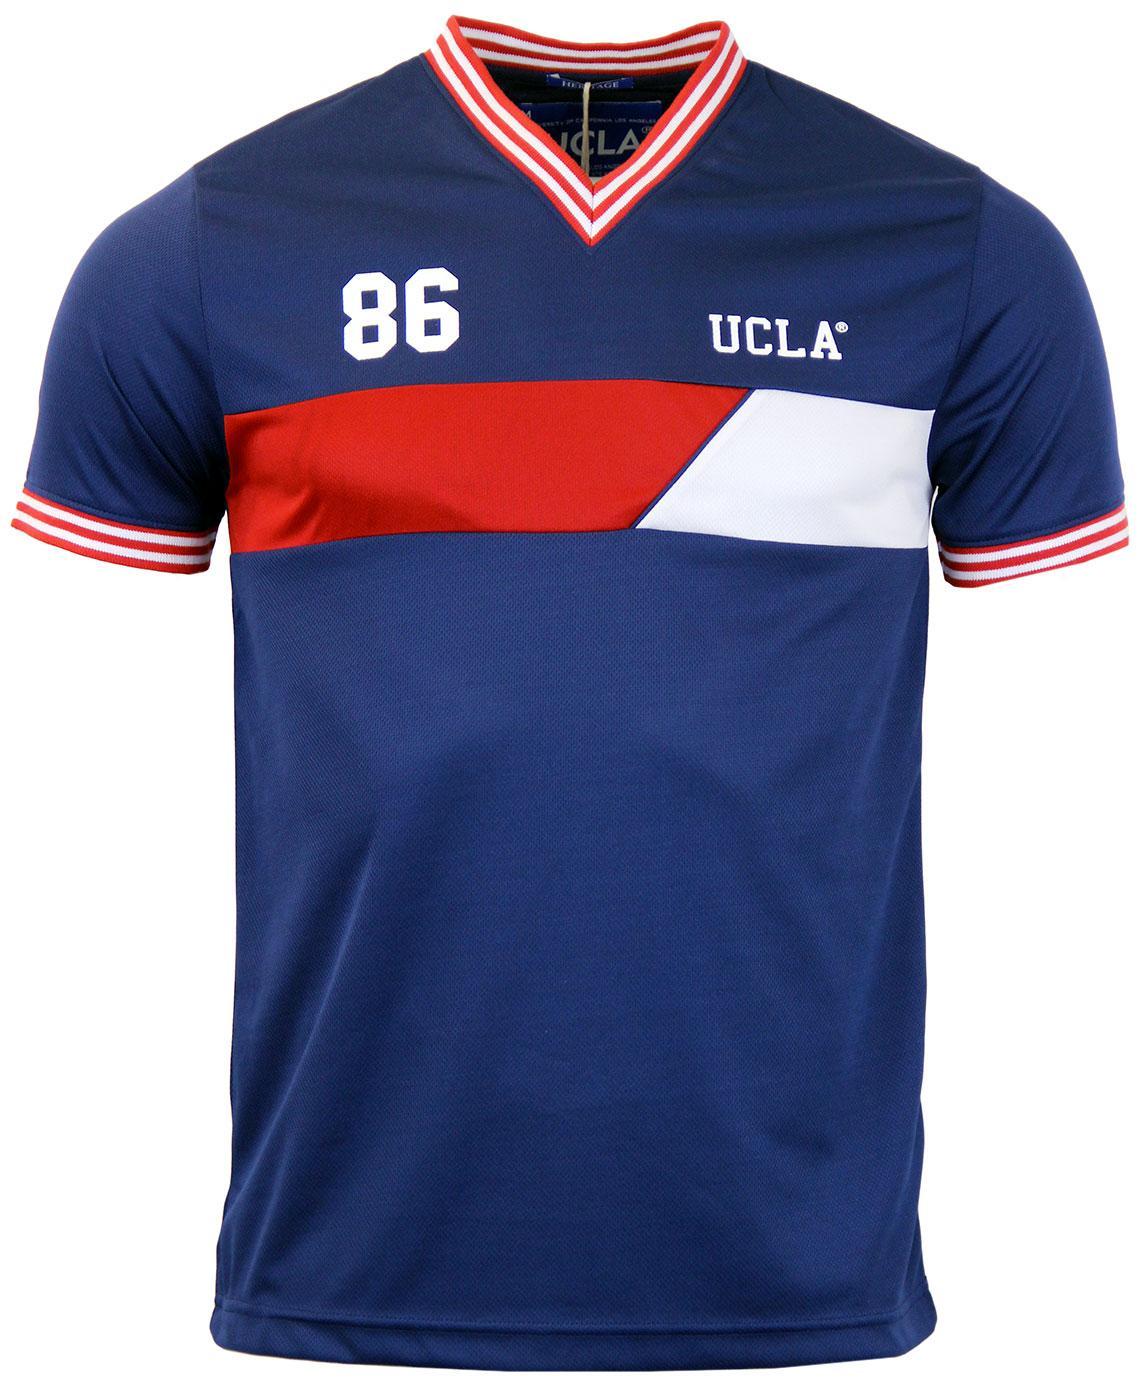 Dorral UCLA Retro Indie V-Neck Chest Panel T-shirt